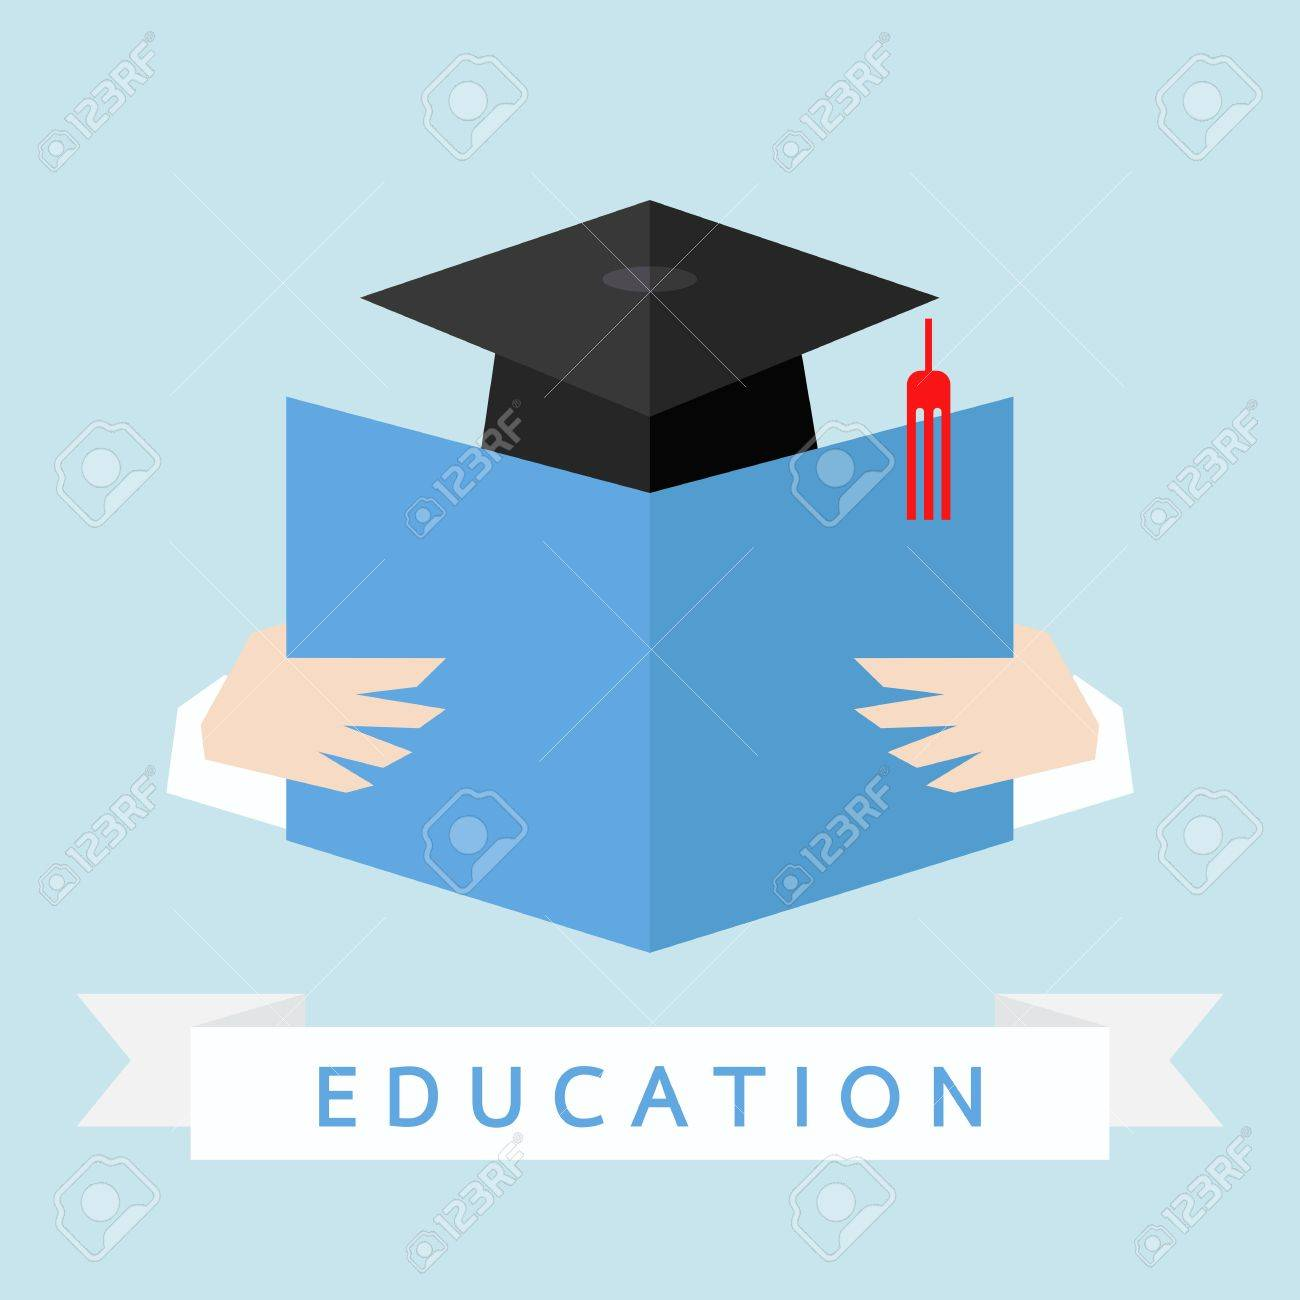 education icon, vector Stock Vector - 20980863